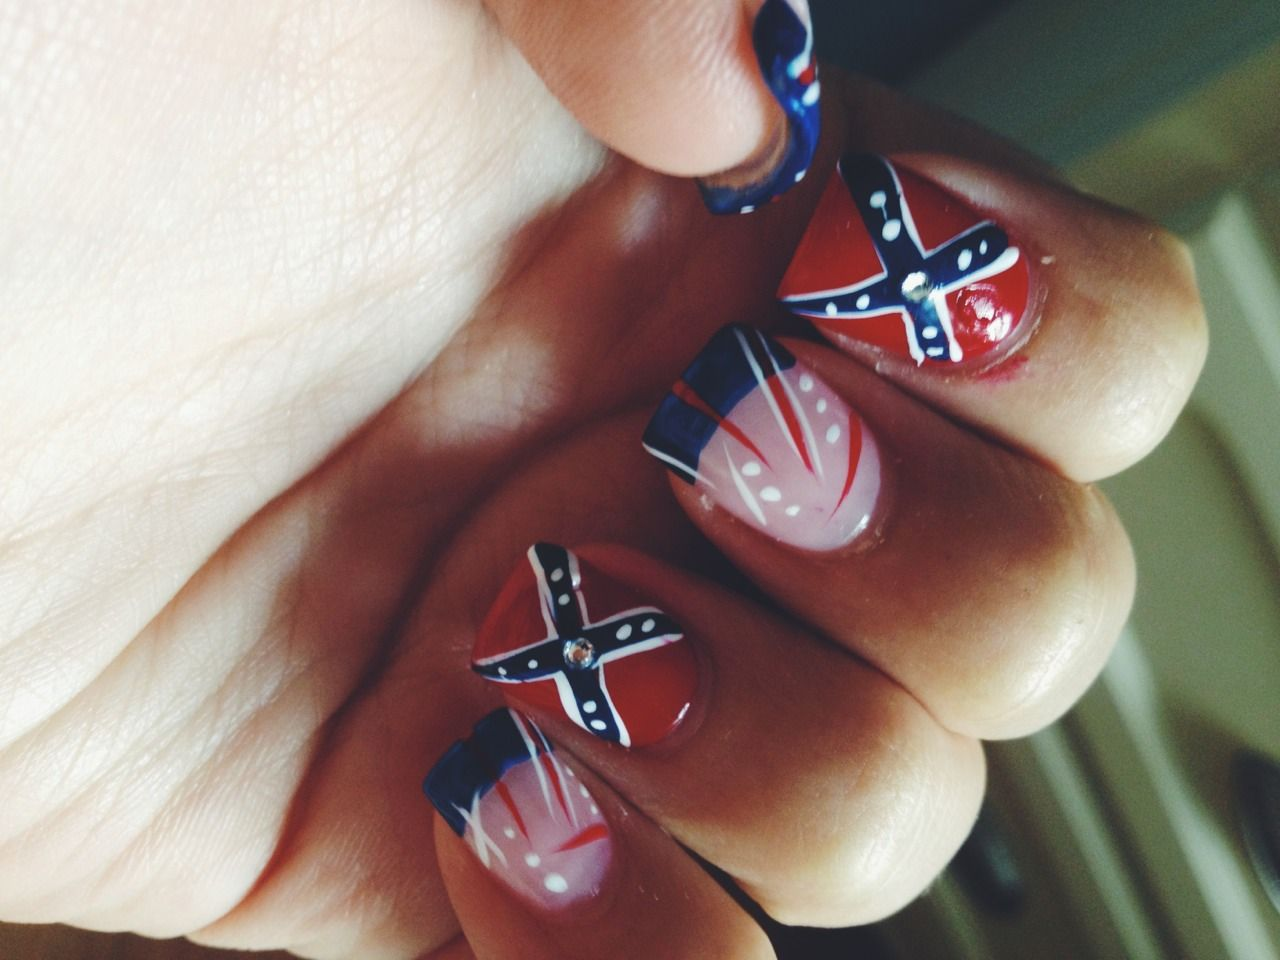 Countrybeauty xo photo super cute ideas pinterest rebel countrybeauty xo photo nail designsrebel flag prinsesfo Gallery